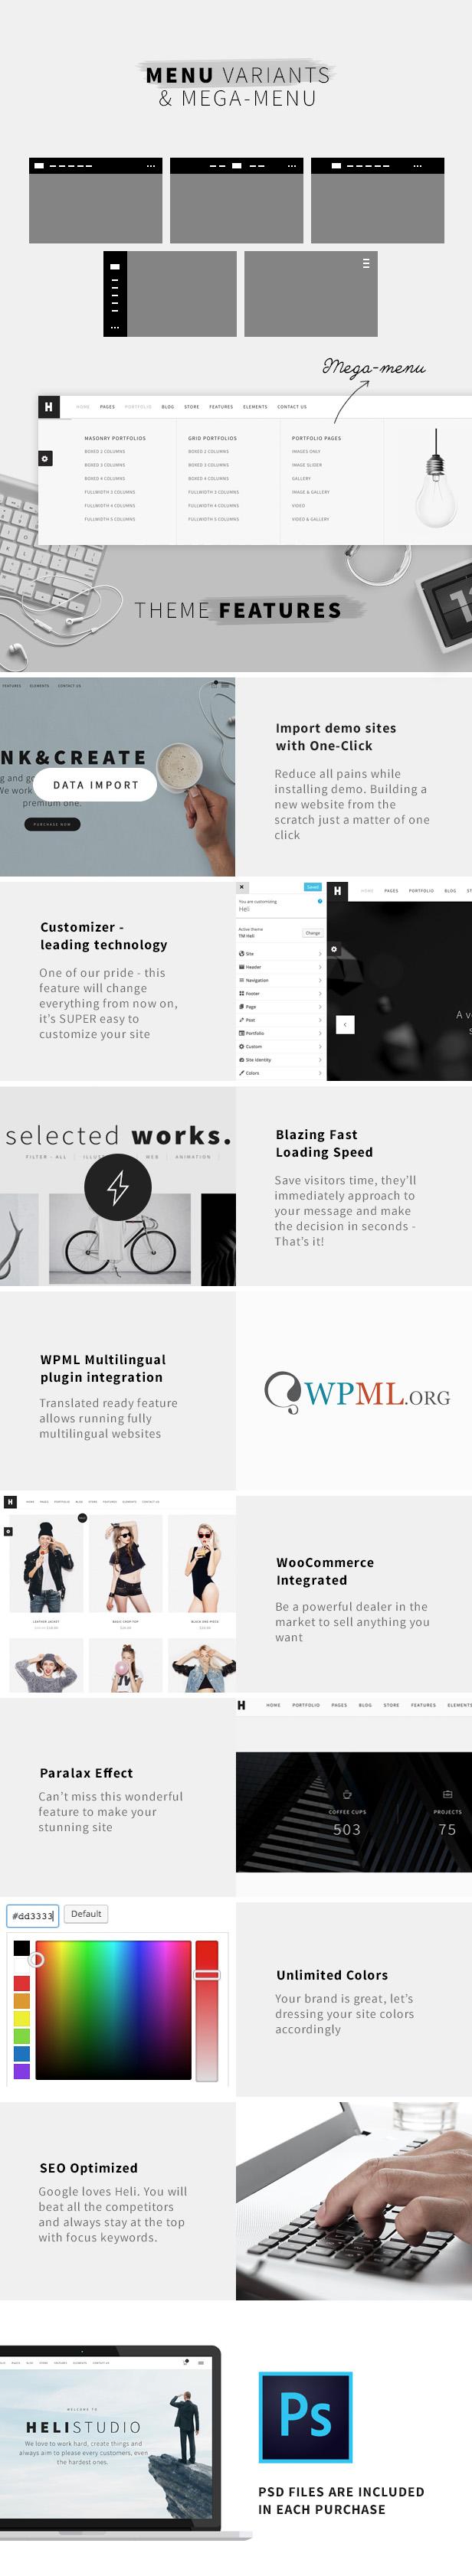 Minimal Creative Black and White WordPress Theme - Various layouts of black n white theme like Heli